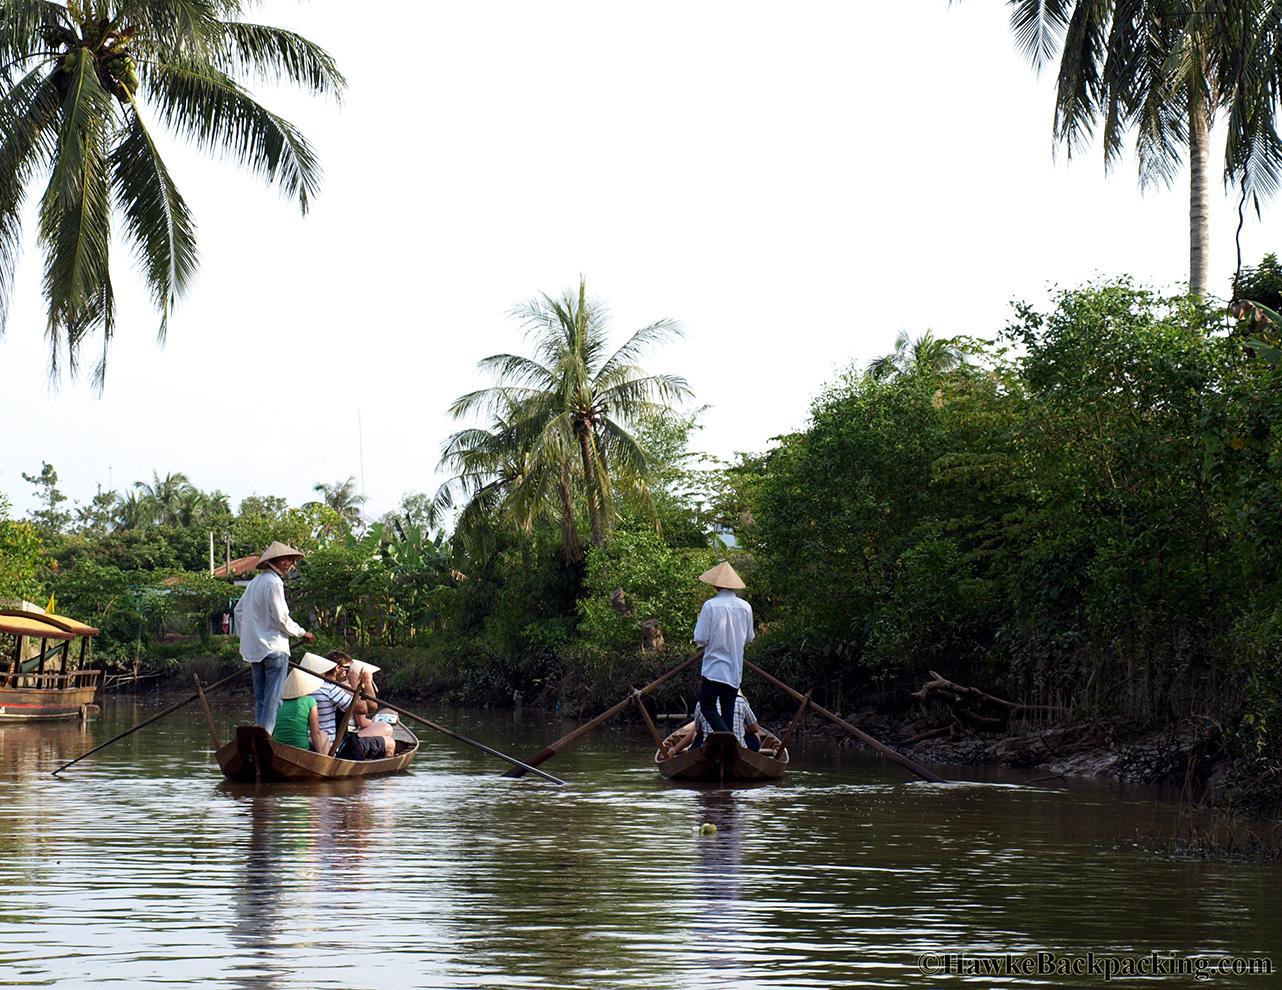 Mekong Delta - HawkeBackpacking.com